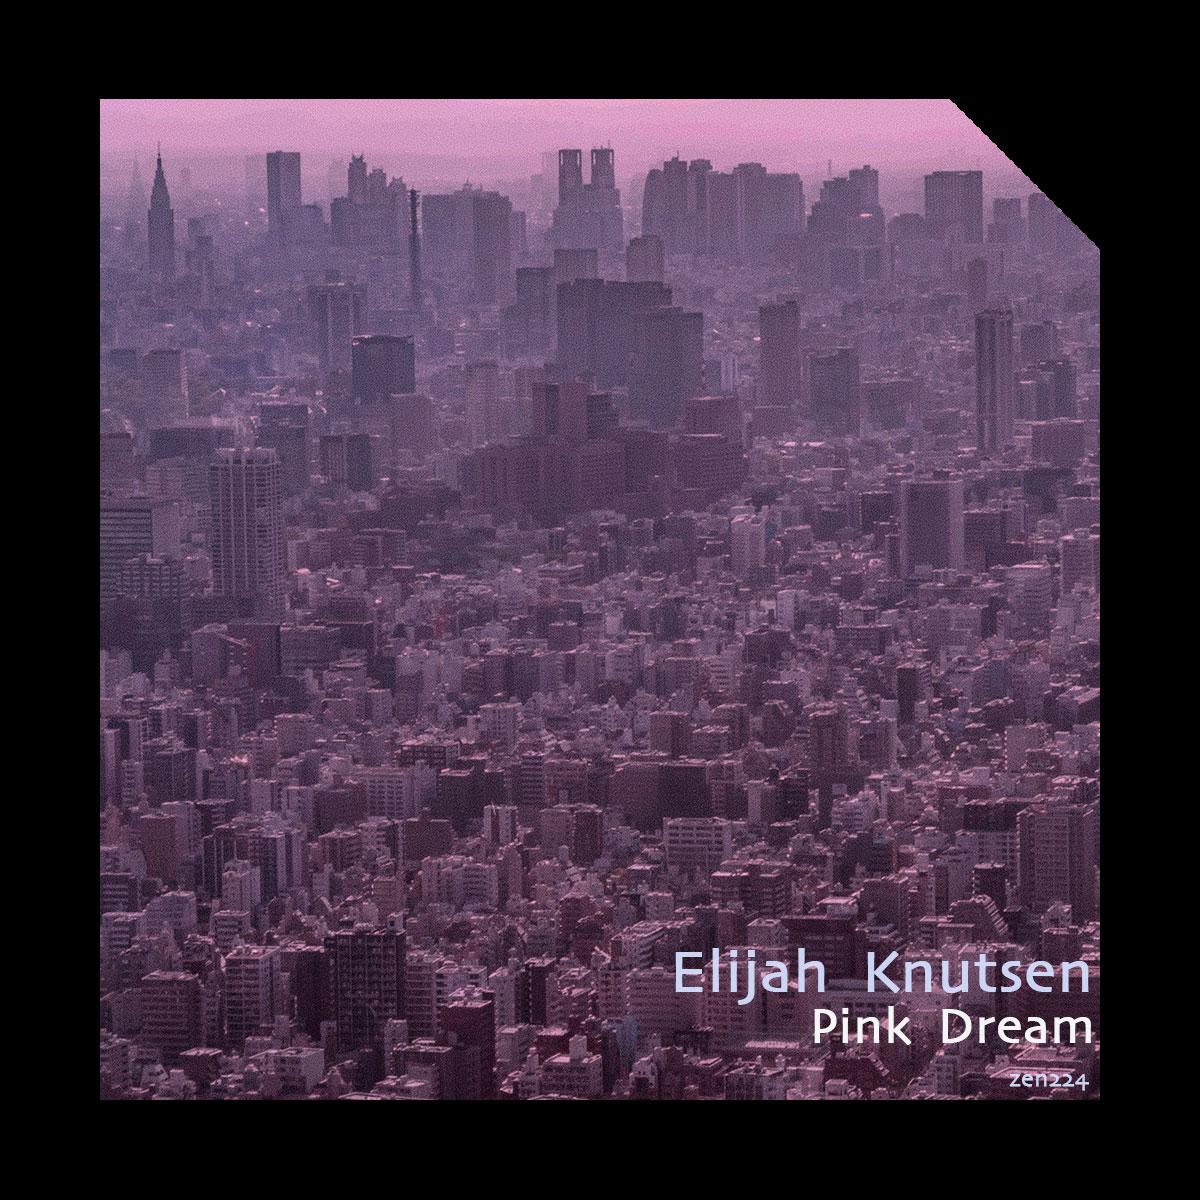 Elijah Knutsen – Pink Dream